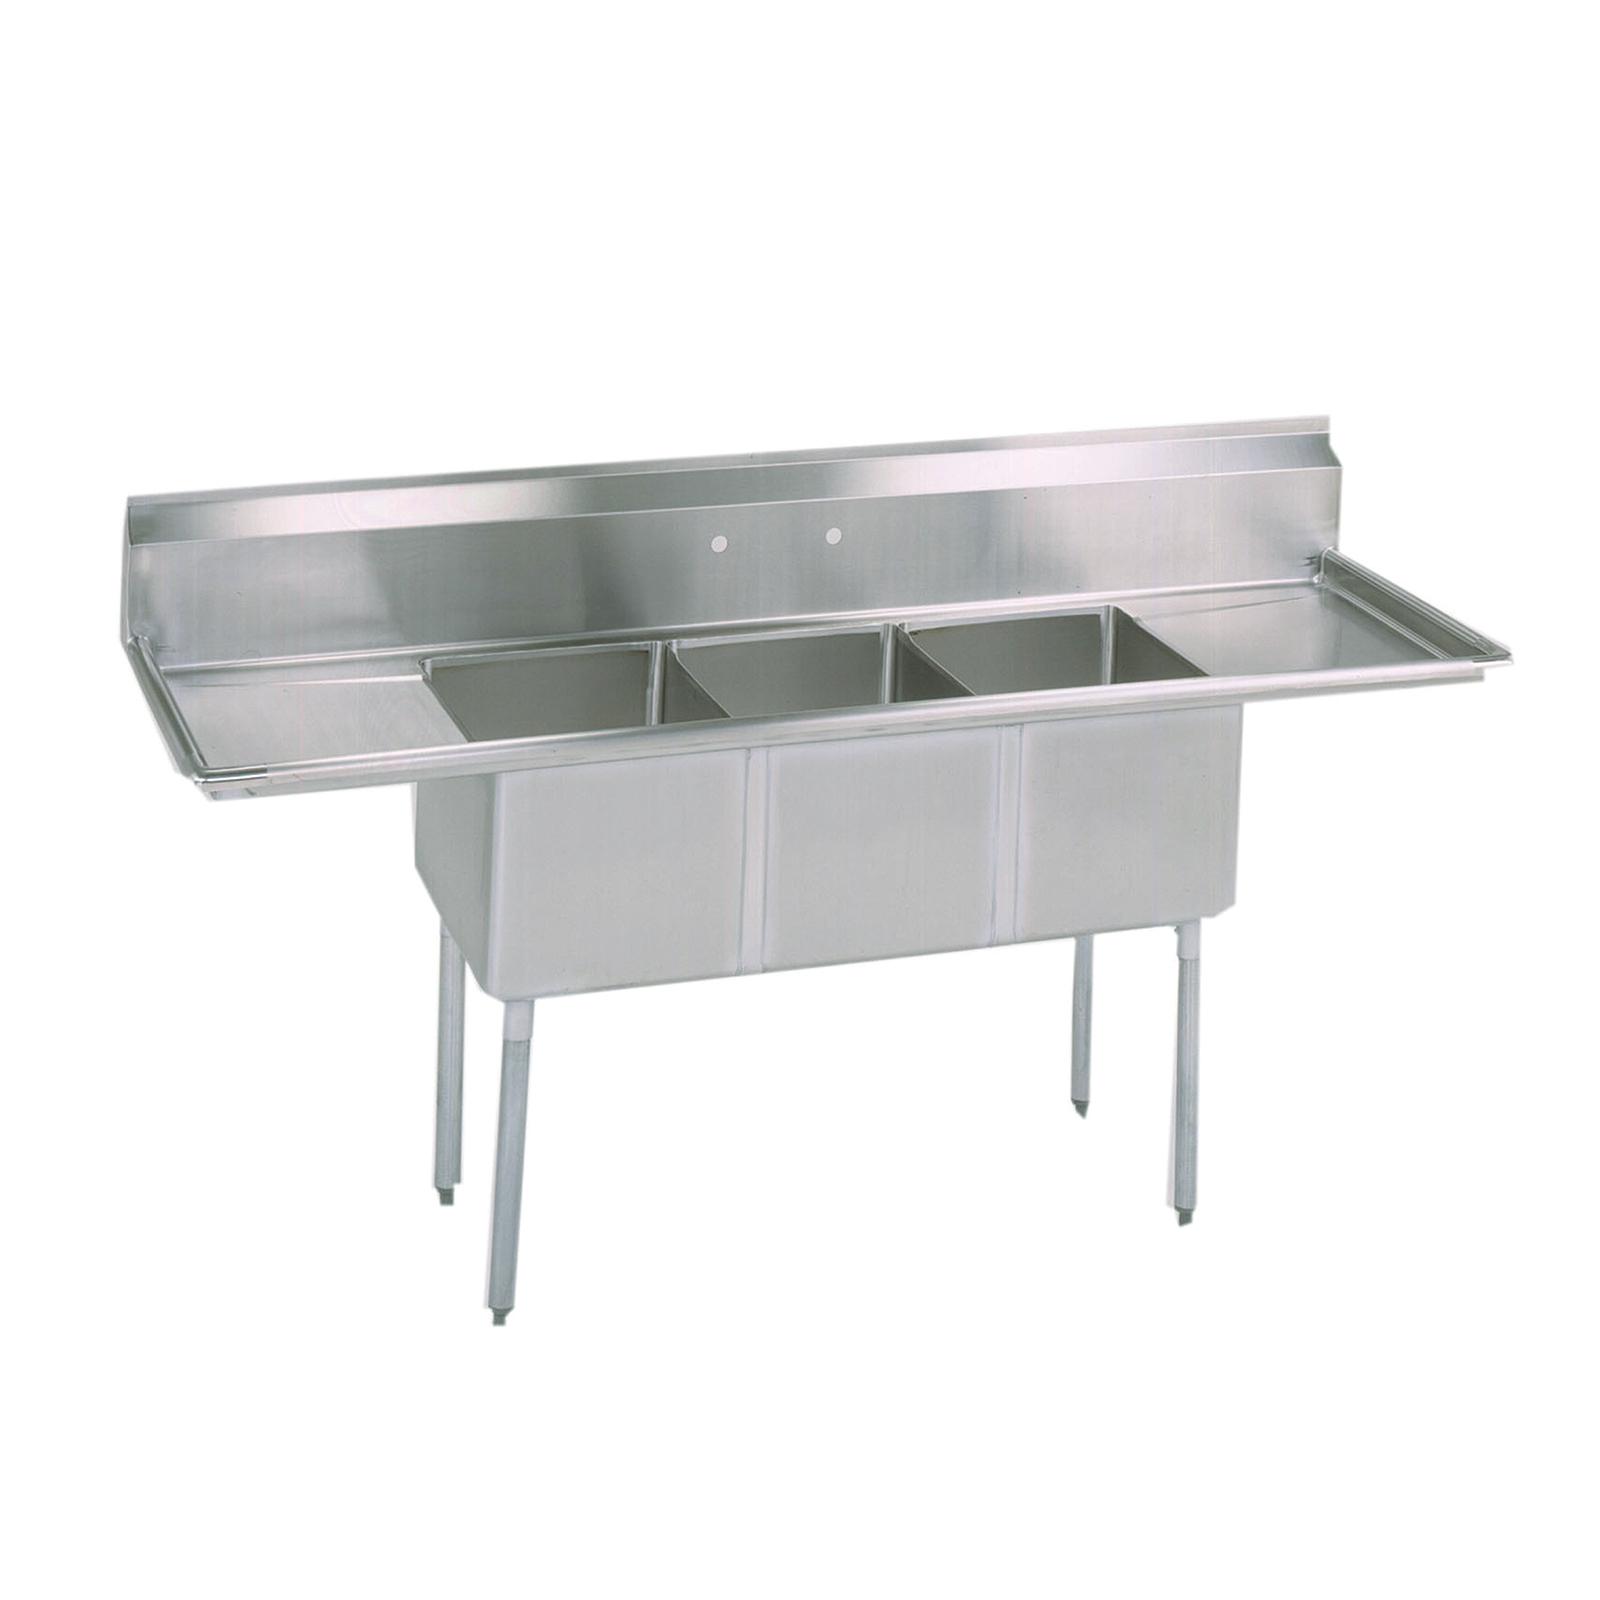 BK Resources BKS-3-1824-14-18T sink, (3) three compartment